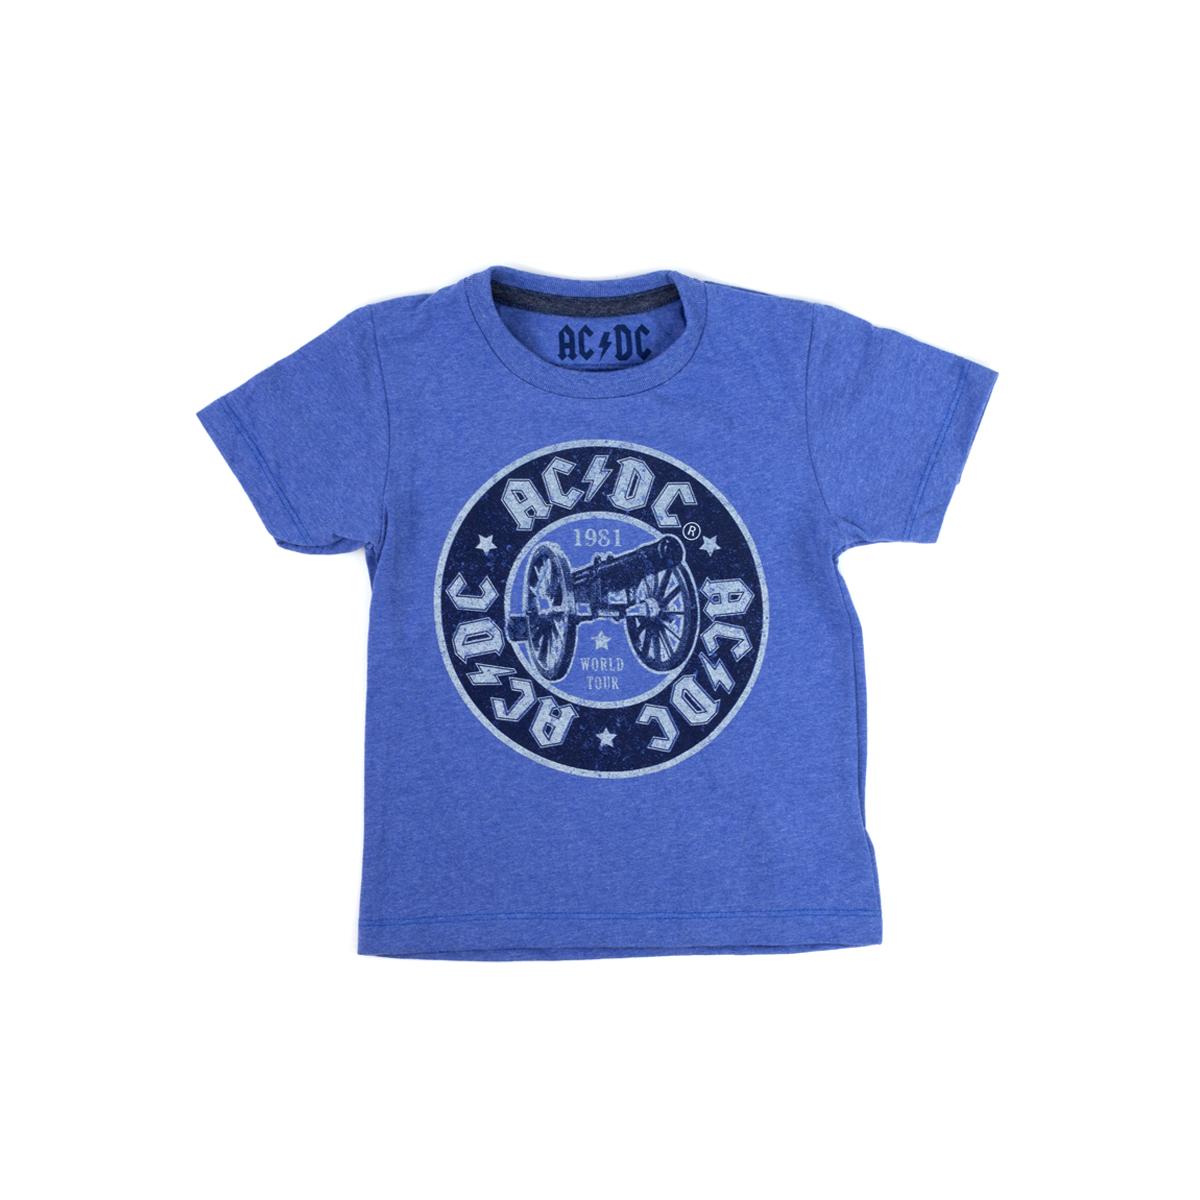 AC/DC Cannon Logo Purple Toddler T-shirt